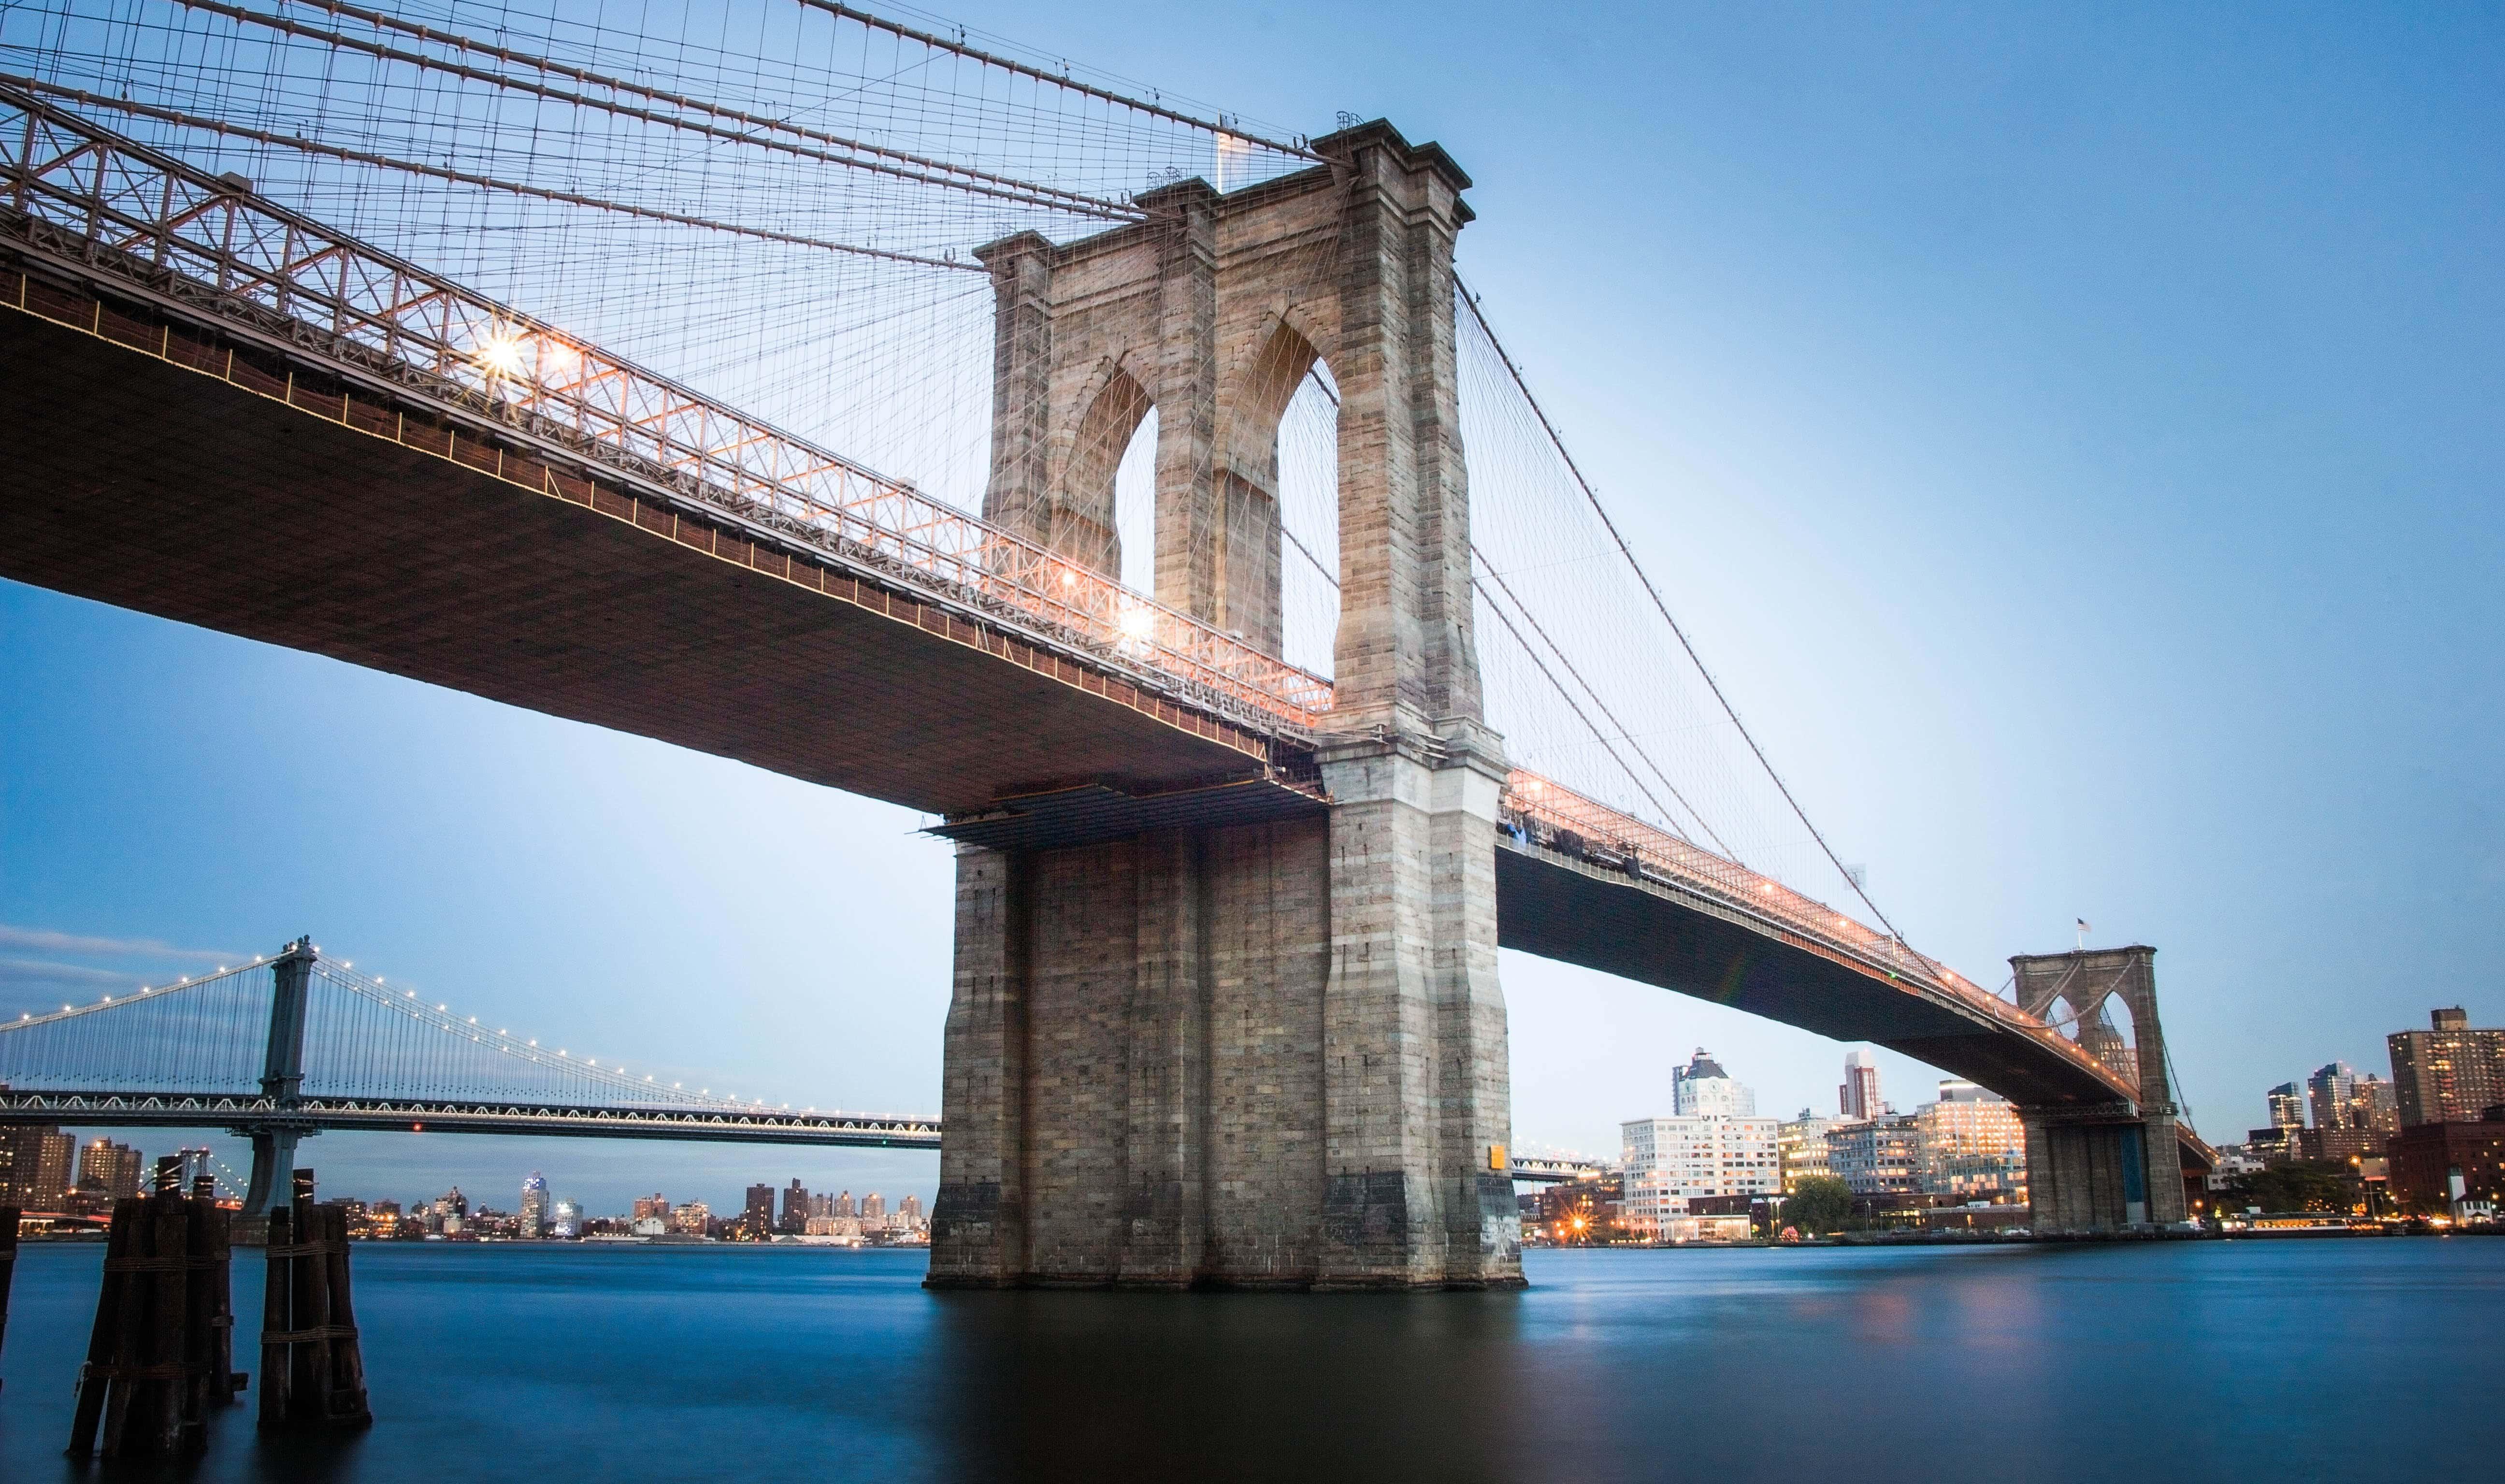 Brooklyn Bridge, Icon on NYC